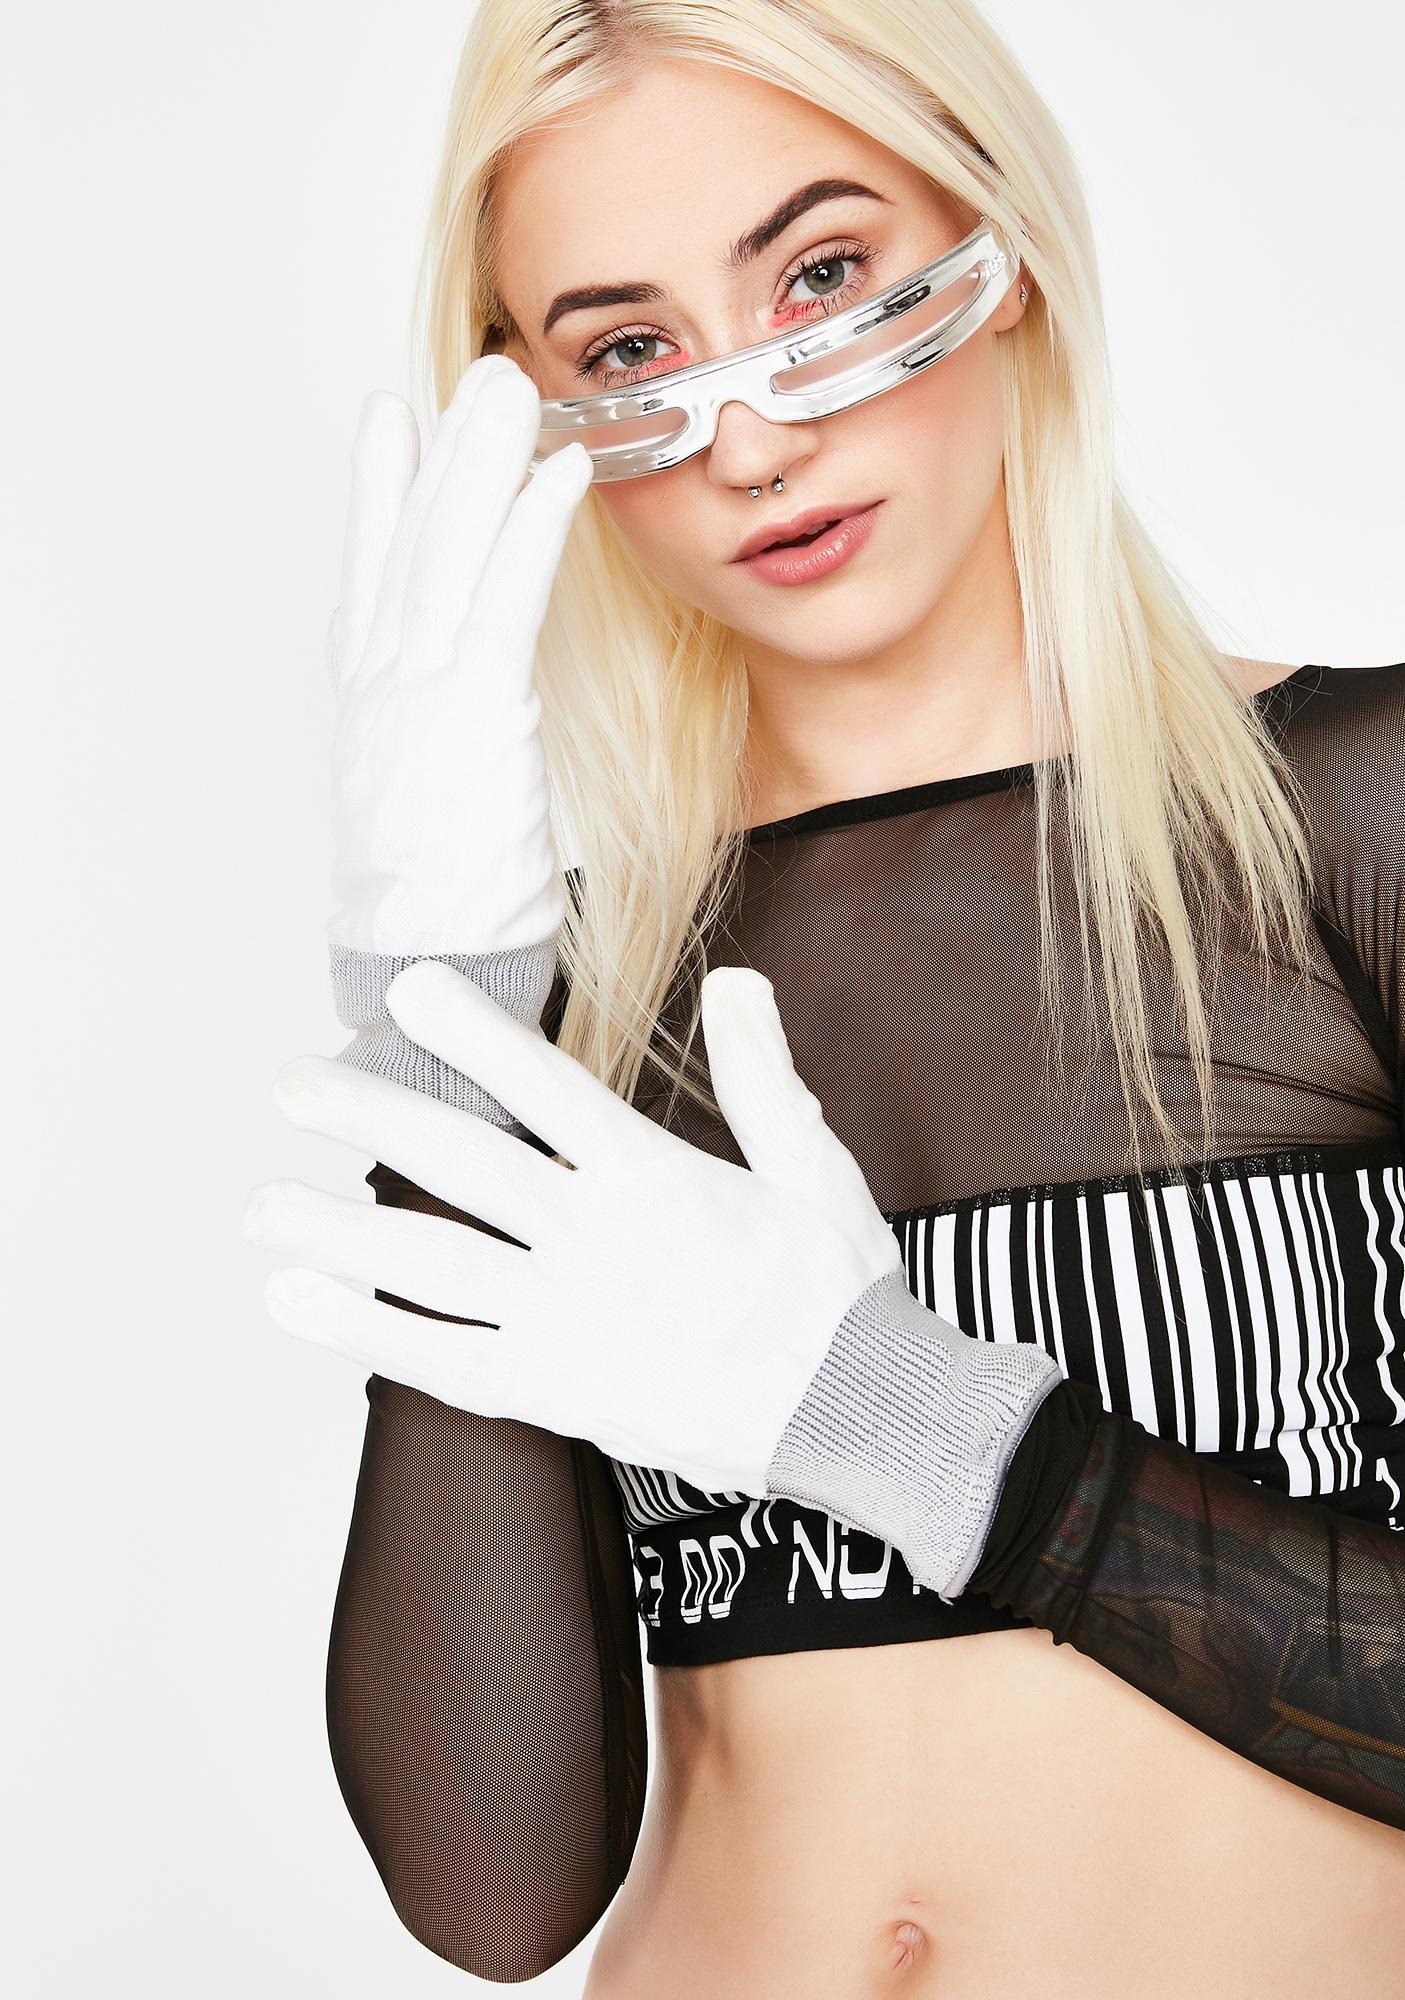 Cyberdog LED Fibre Gloves